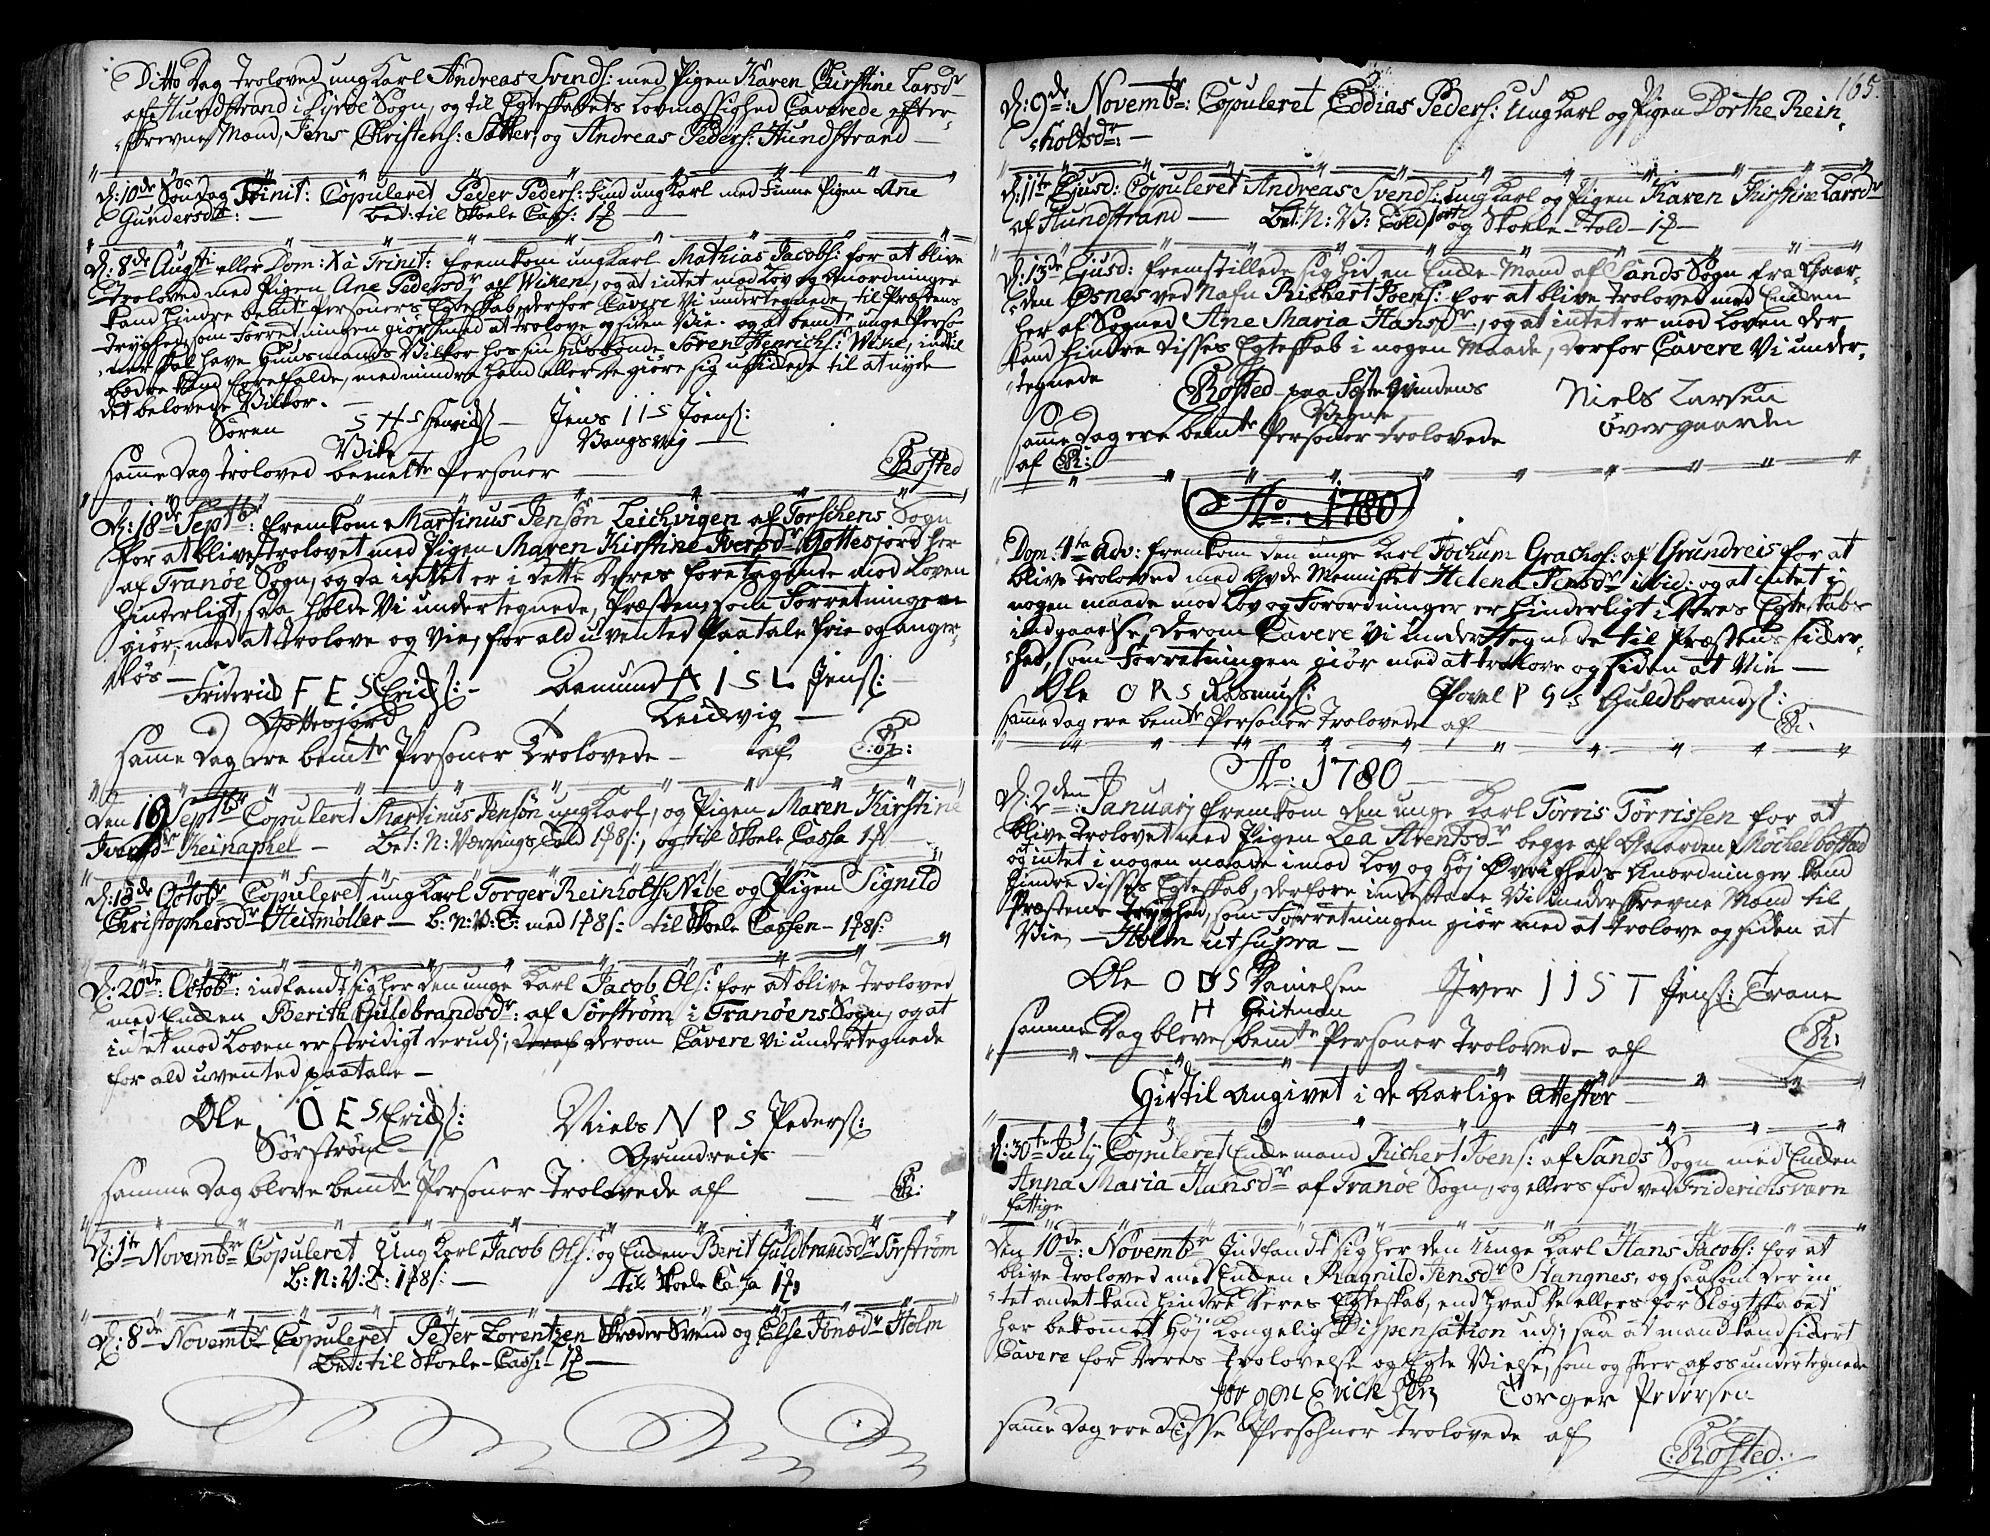 SATØ, Tranøy sokneprestkontor, I/Ia/Iaa/L0002kirke: Ministerialbok nr. 2, 1773-1806, s. 165